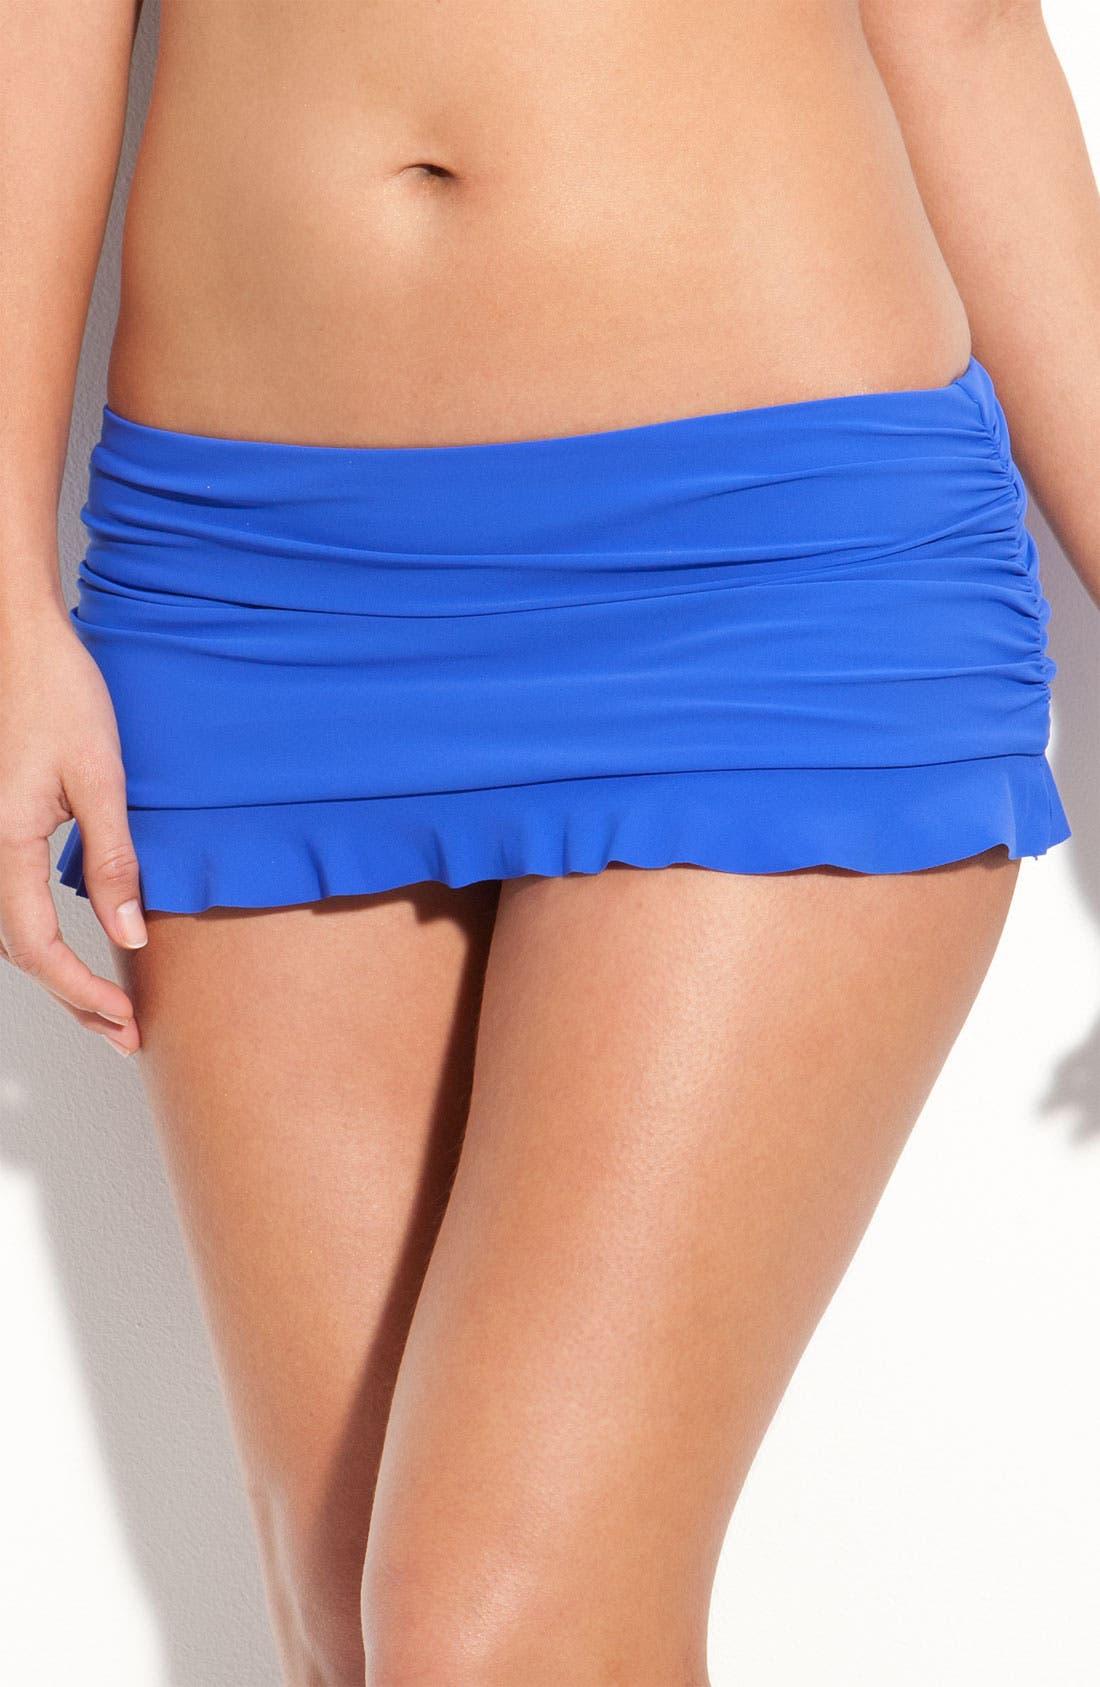 Alternate Image 1 Selected - Profile by Gottex 'Tutti Frutti' Shirred Skirted Bikini Bottoms